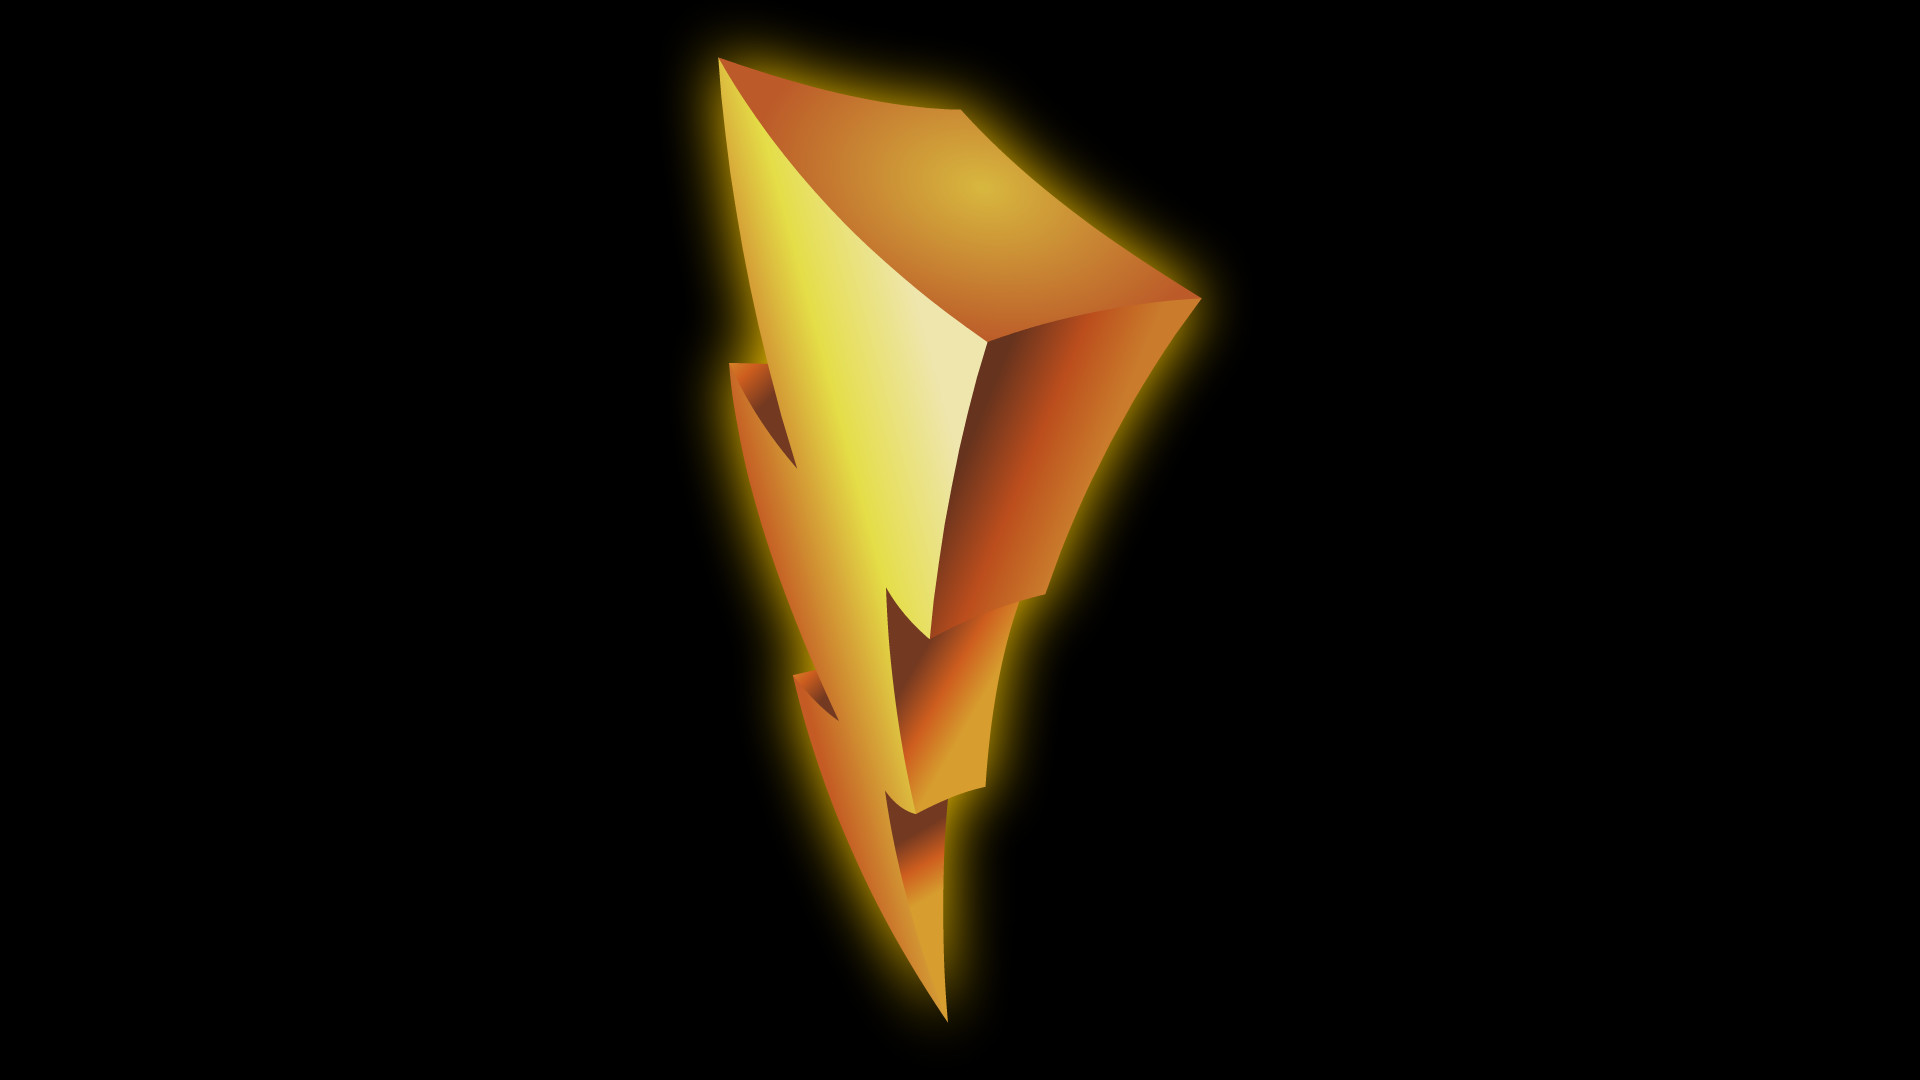 … Mighty Morphin Power Rangers Symbol by Yurtigo